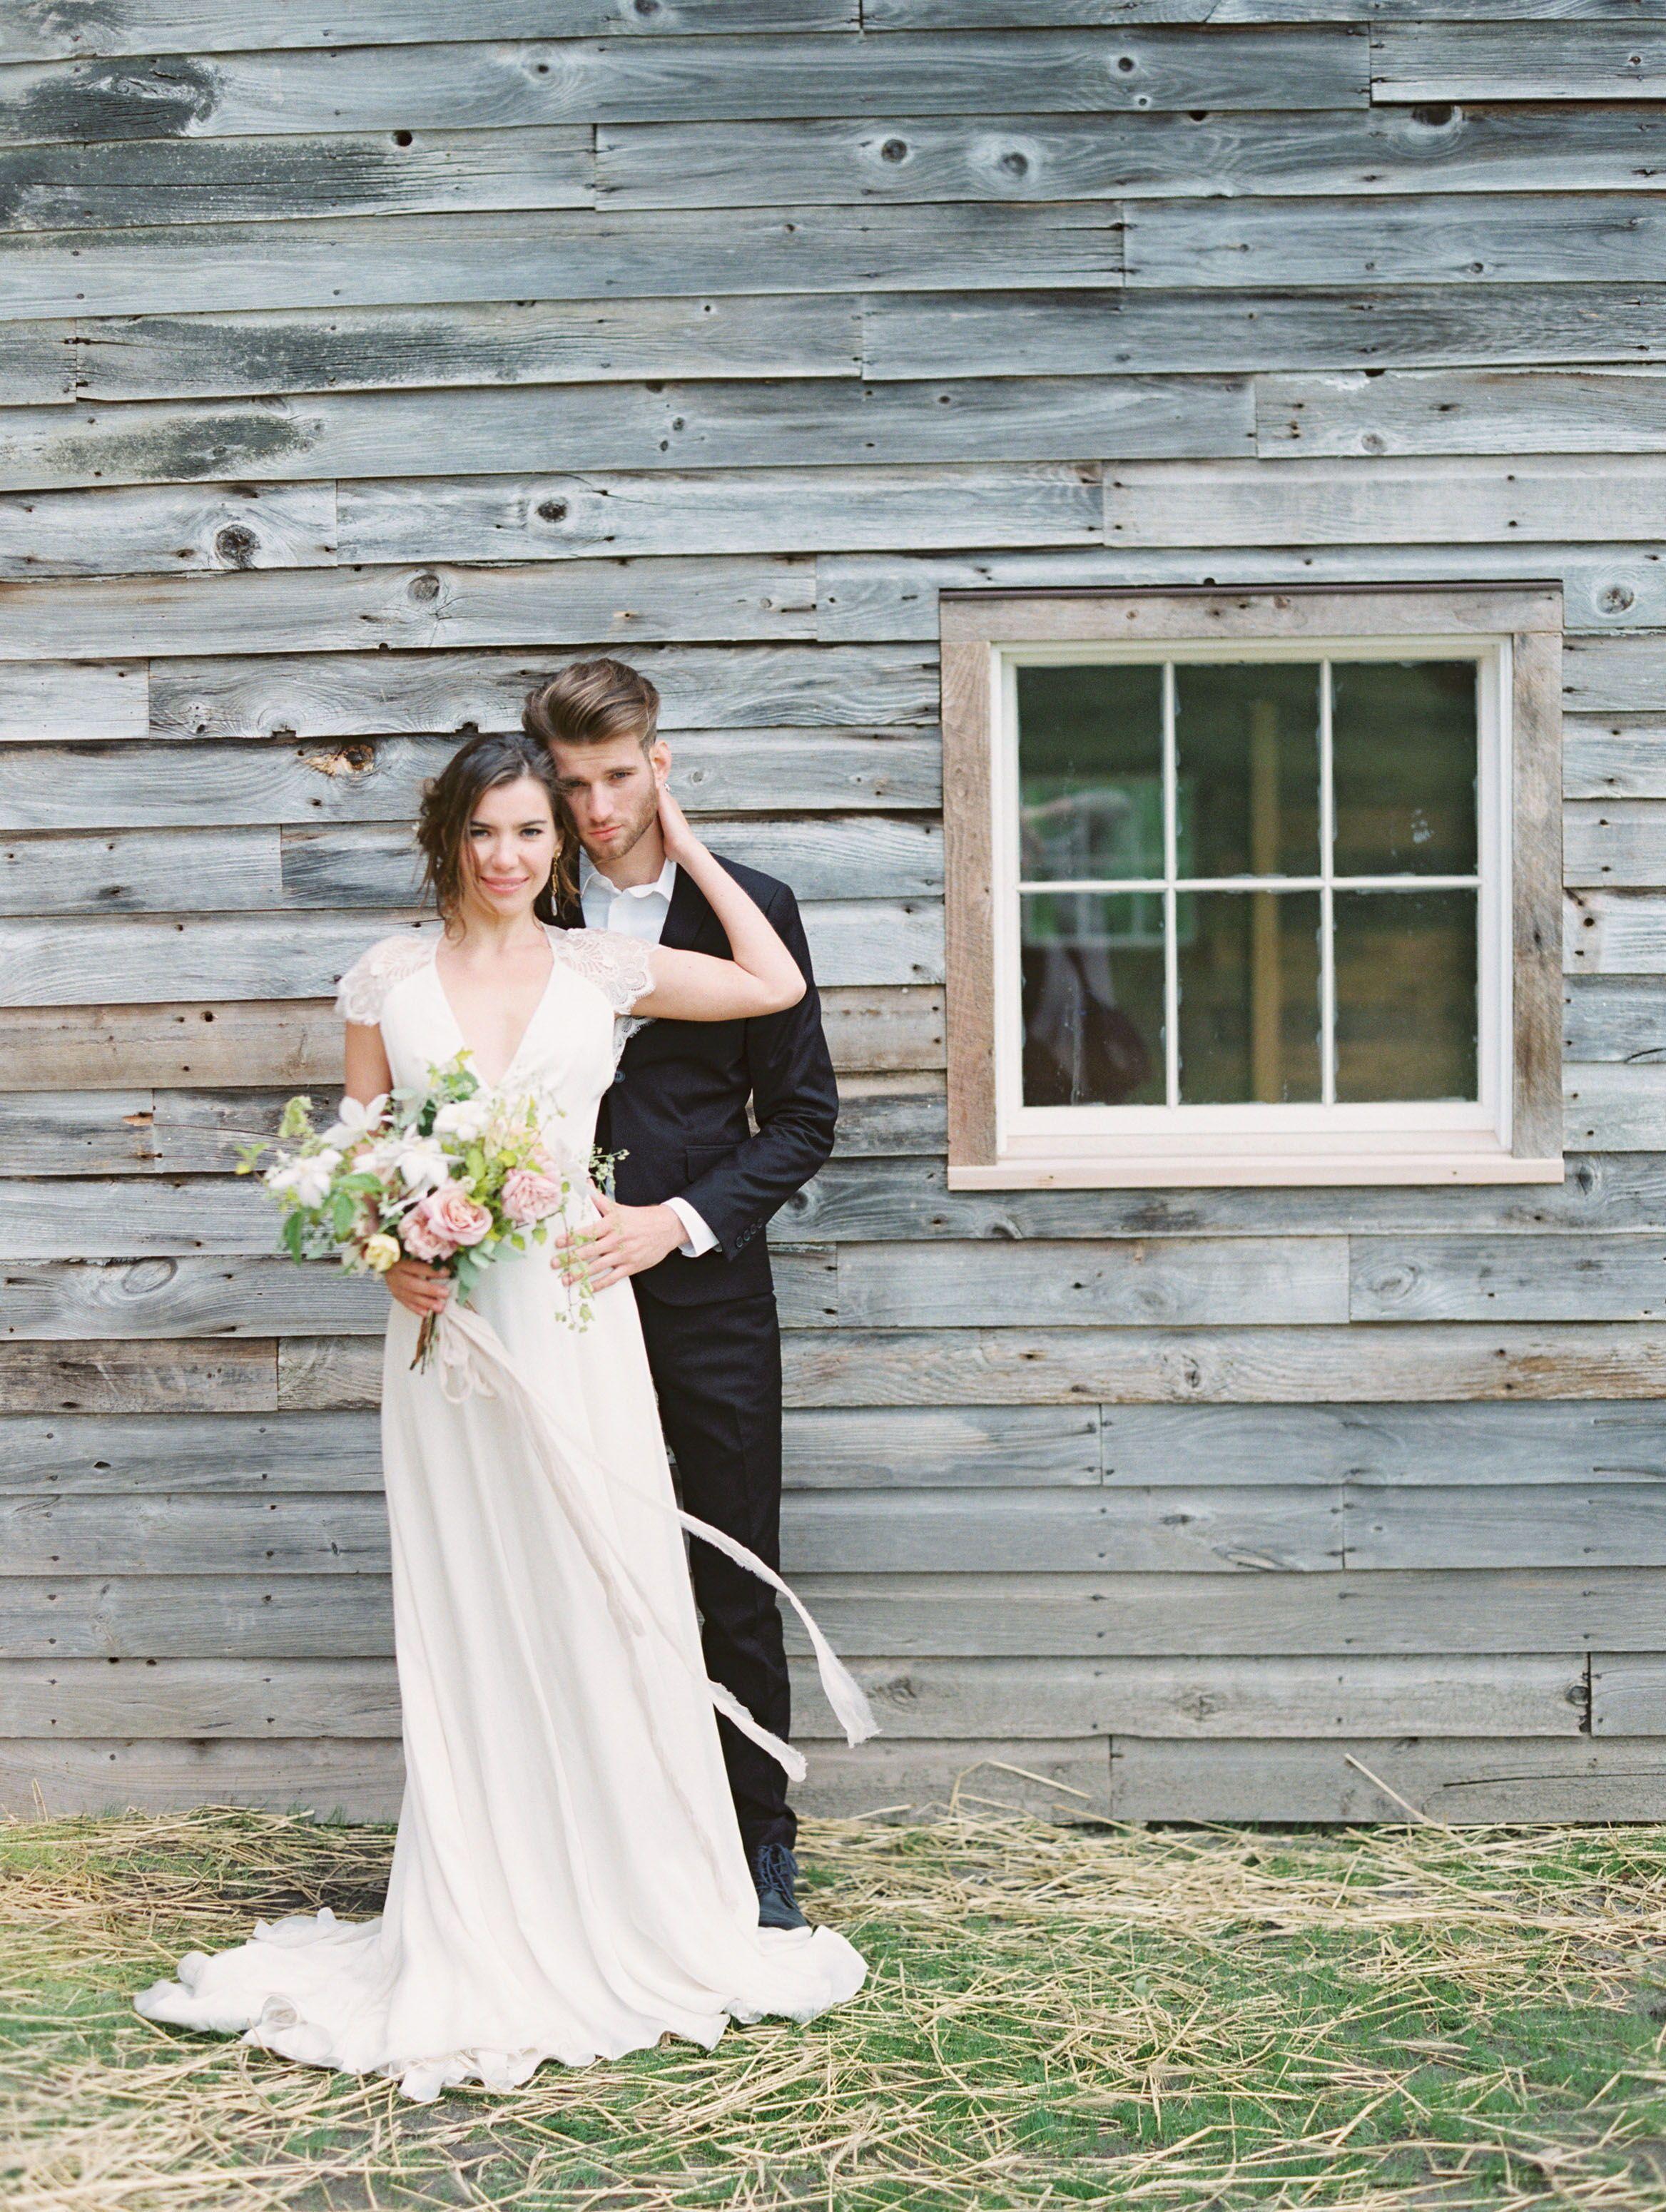 c93f0a186e83 Field wedding